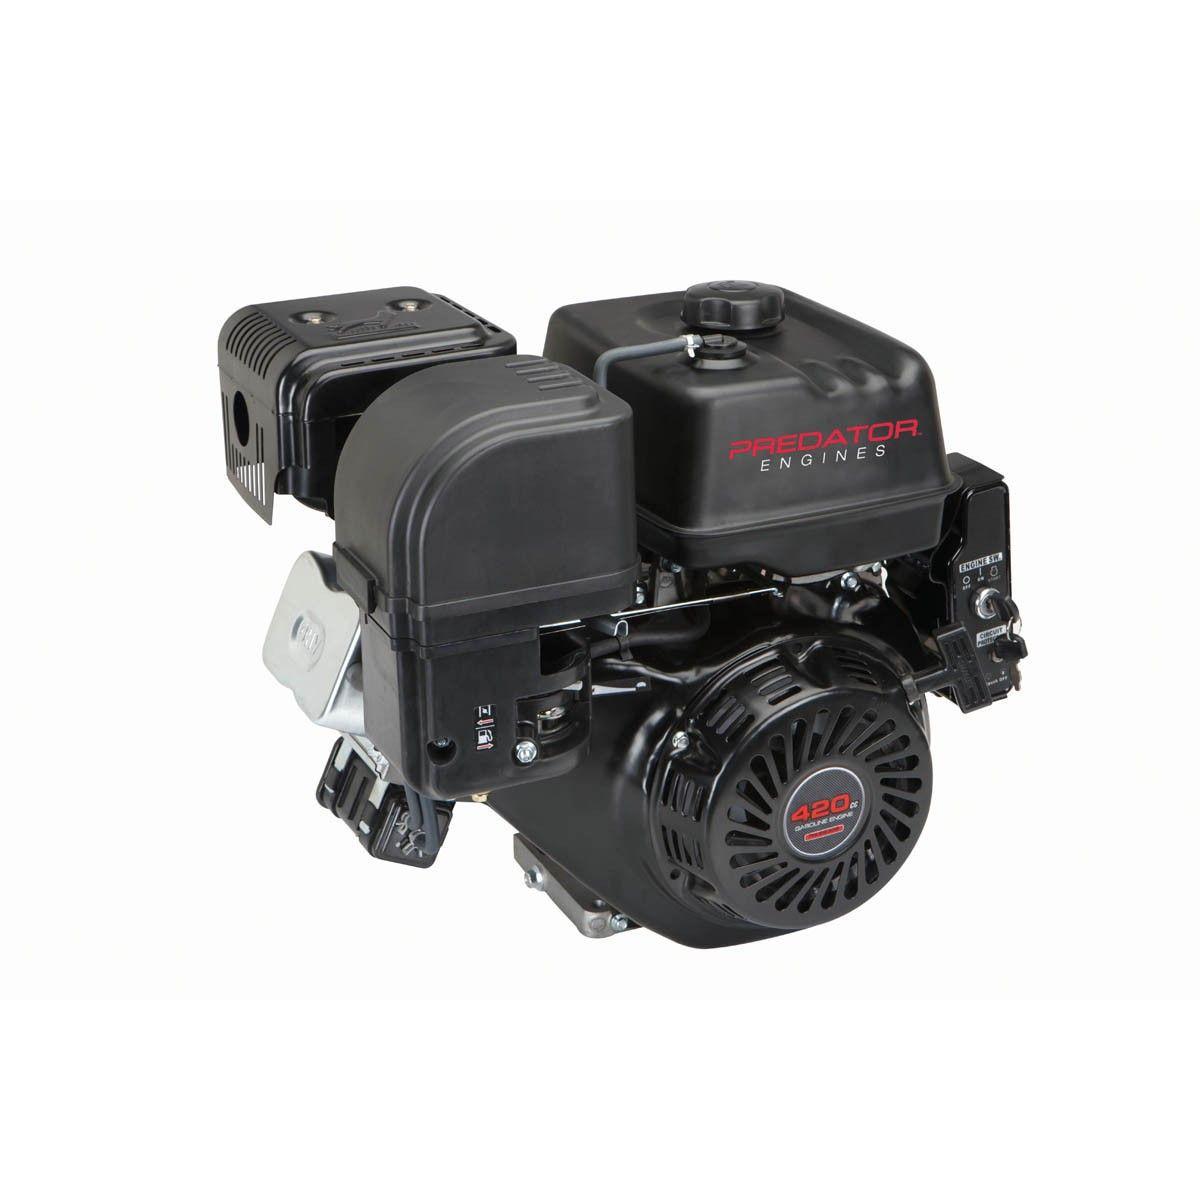 13 HP (420cc) OHV Horizontal Shaft Gas Engine EPA | Gas